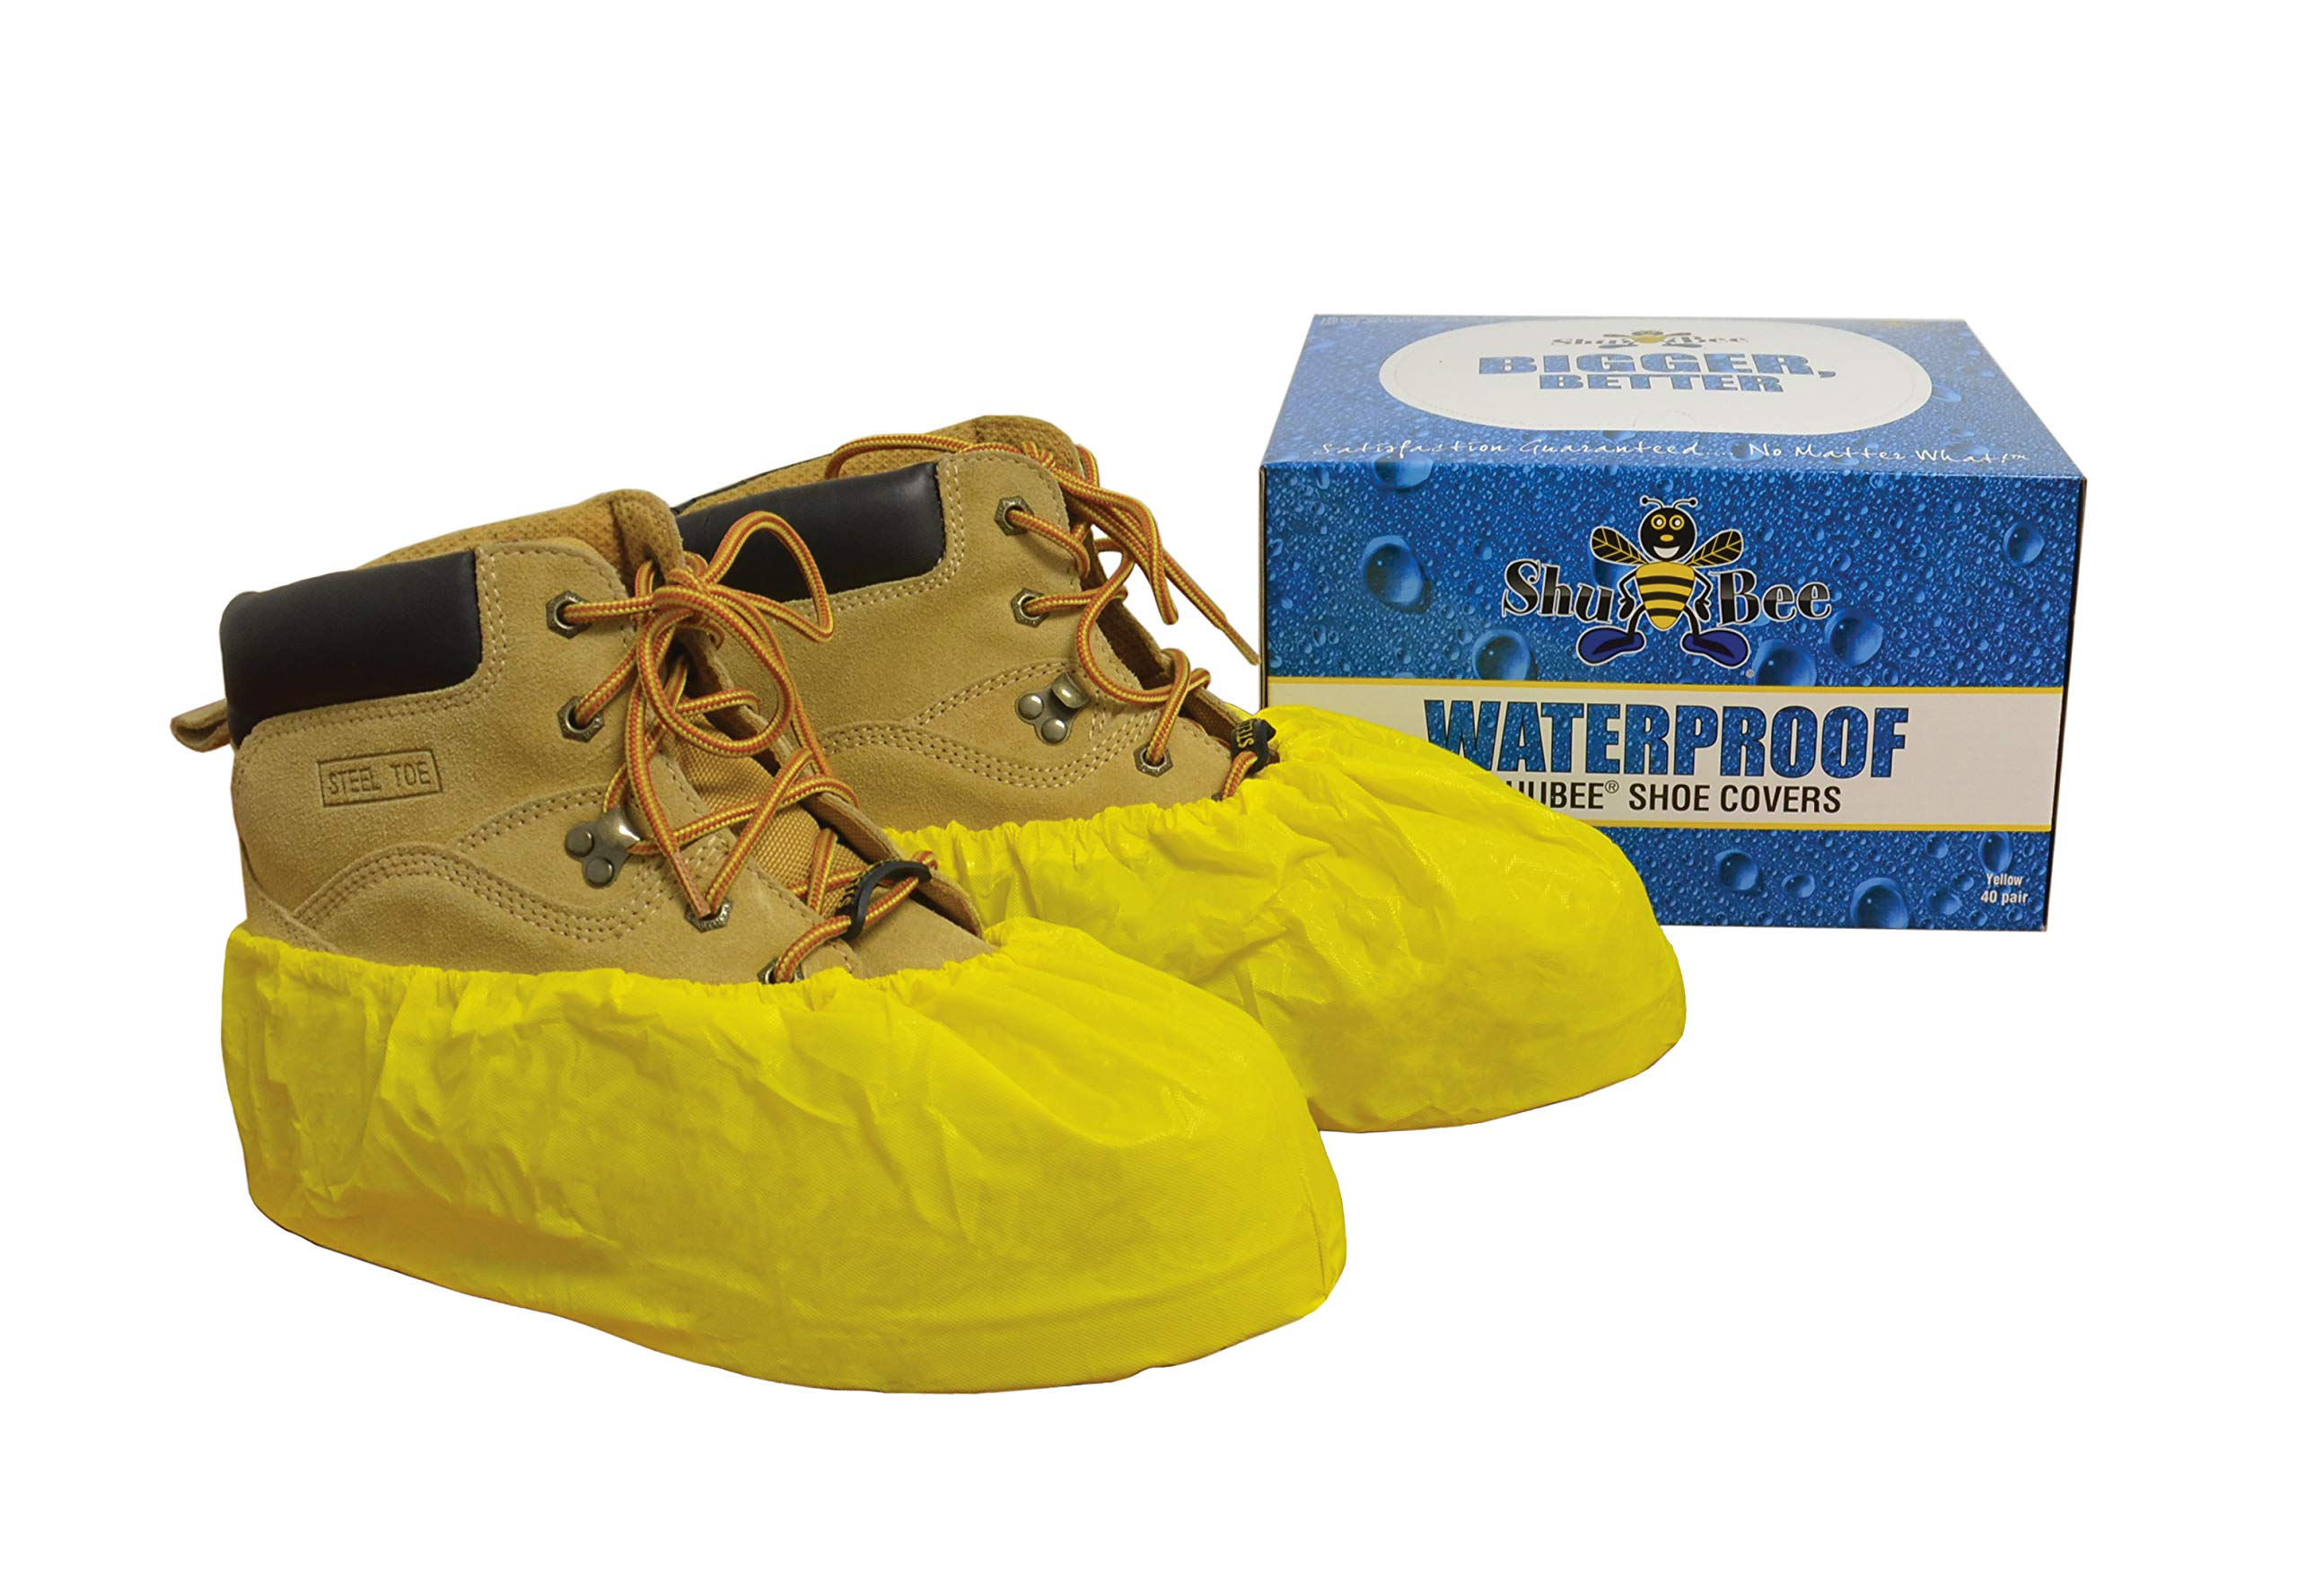 ShuBee Waterproof Shoe Covers, Yellow (40 Pair) by ShuBee (Image #1)